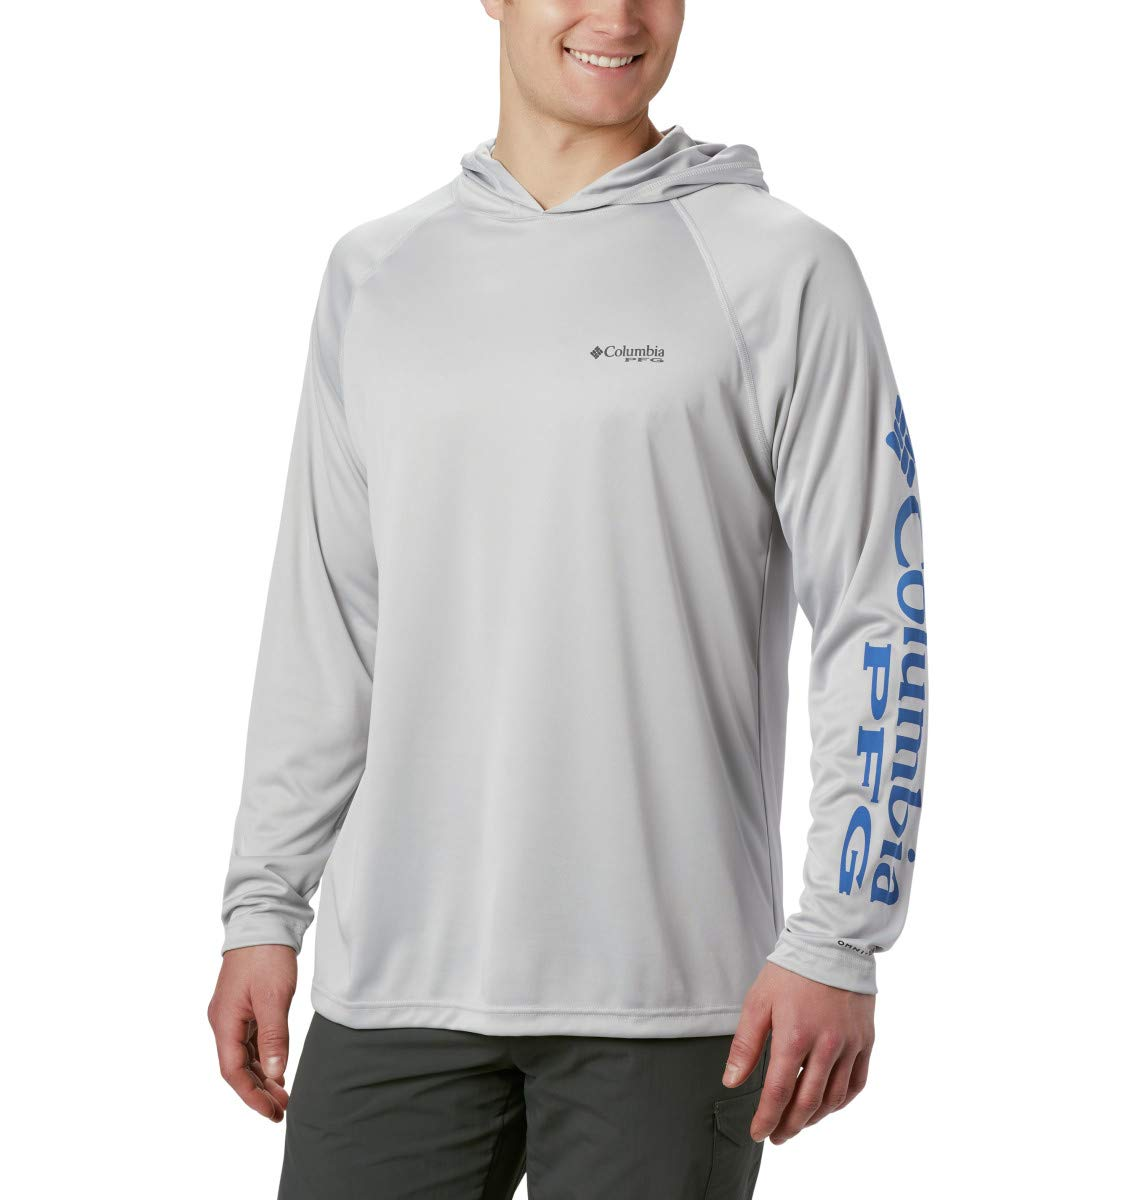 Columbia Men's Standard Terminal Tackle Hoodie, Cool Grey, Vivid Blue Logo, Large by Columbia